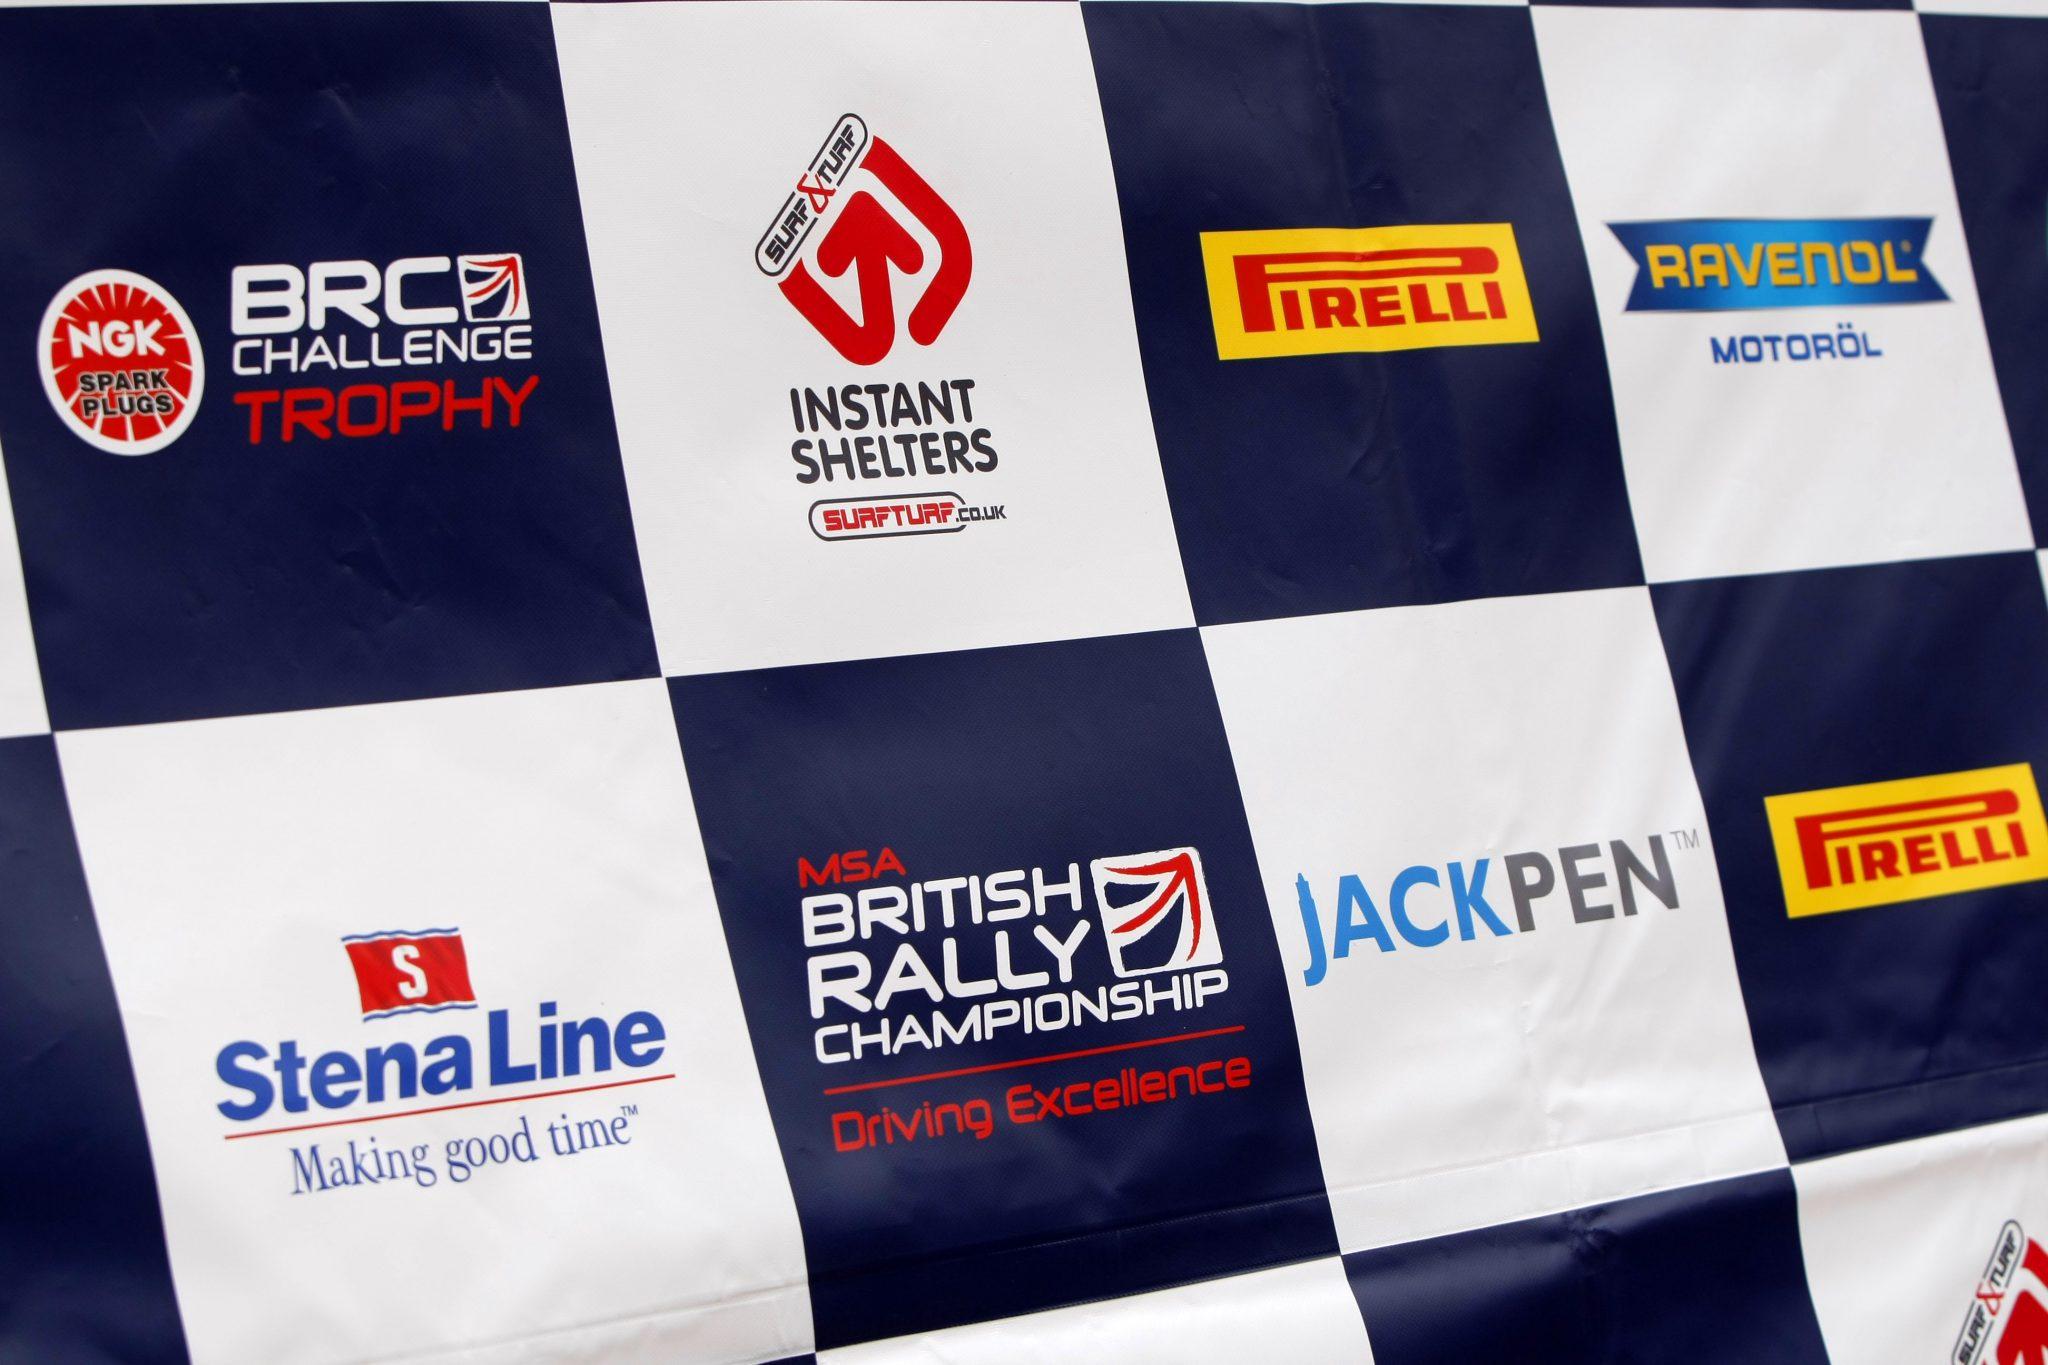 3006, 3006, BRC Sponsors, Sponsors-01.jpg, 850594, https://www.surfturf.co.uk/wp-content/uploads/2018/06/Sponsors-01.jpg, https://www.surfturf.co.uk/case-studies/british-rally/brc-sponsors-2/, , 3, , BRC Sponsors, brc-sponsors-2, inherit, 849, 2018-11-28 14:23:06, 2018-11-28 14:23:06, 0, image/jpeg, image, jpeg, https://www.surfturf.co.uk/wp-includes/images/media/default.png, 3888, 2592, Array